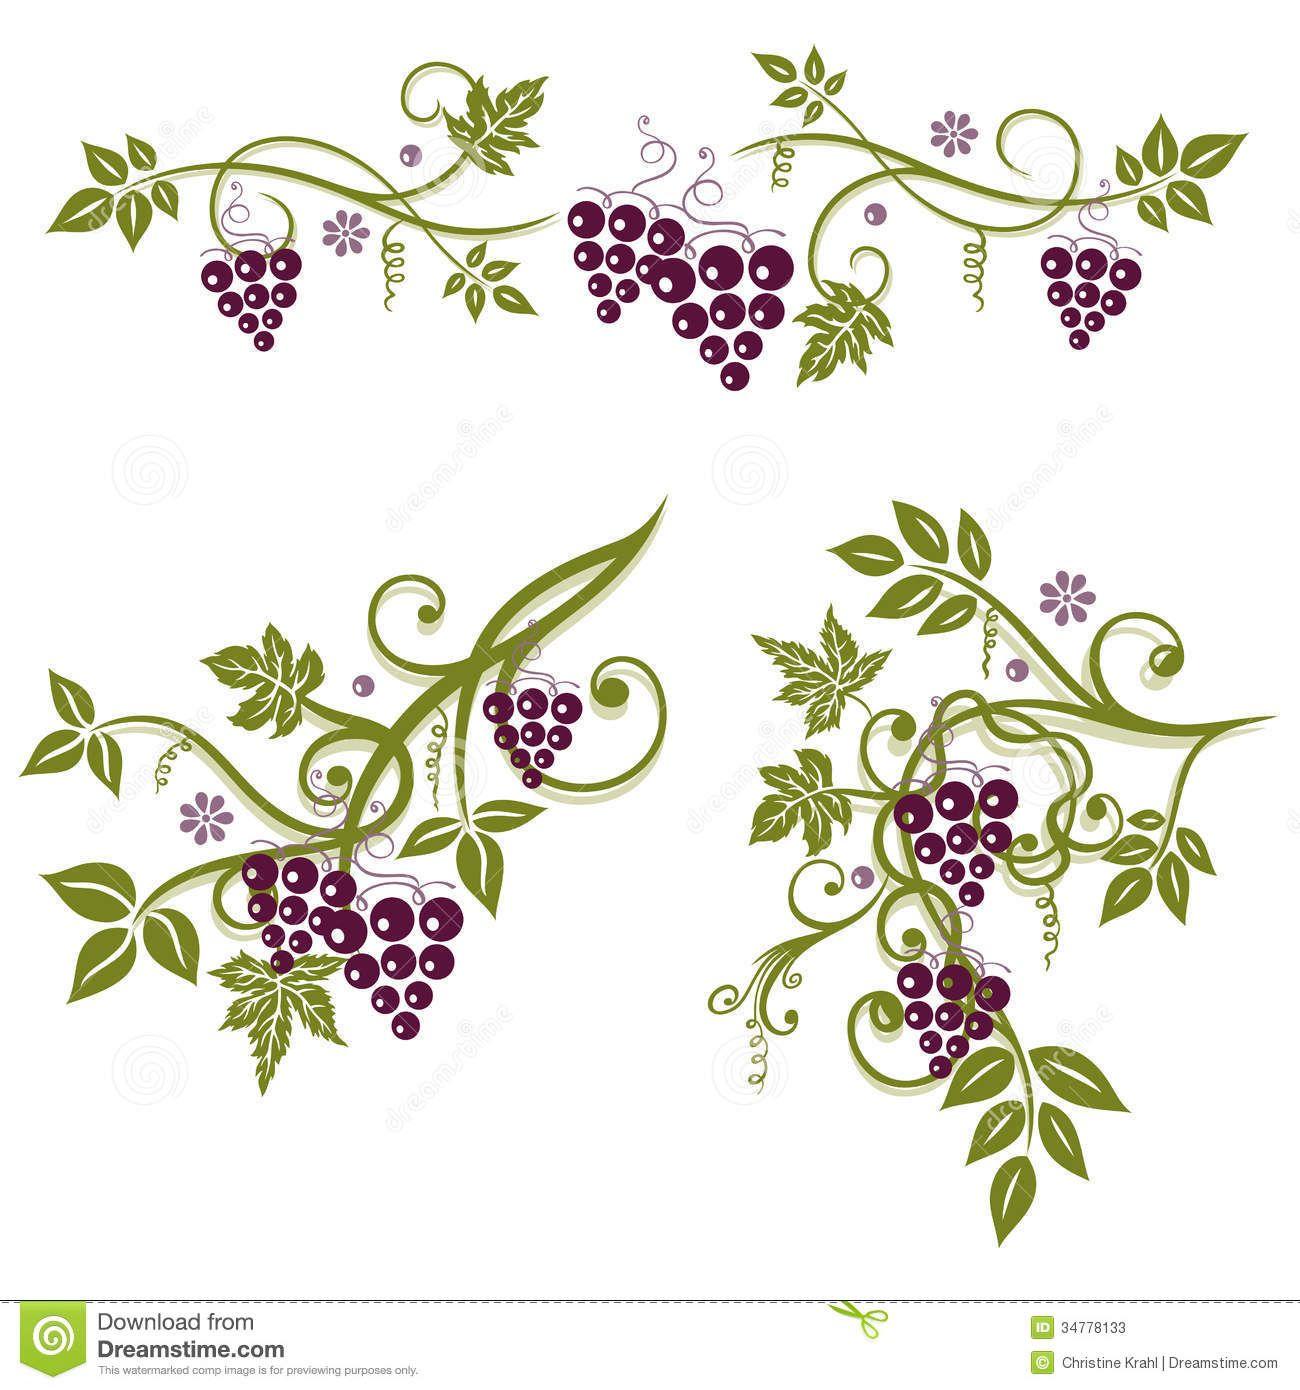 Grape vines image.